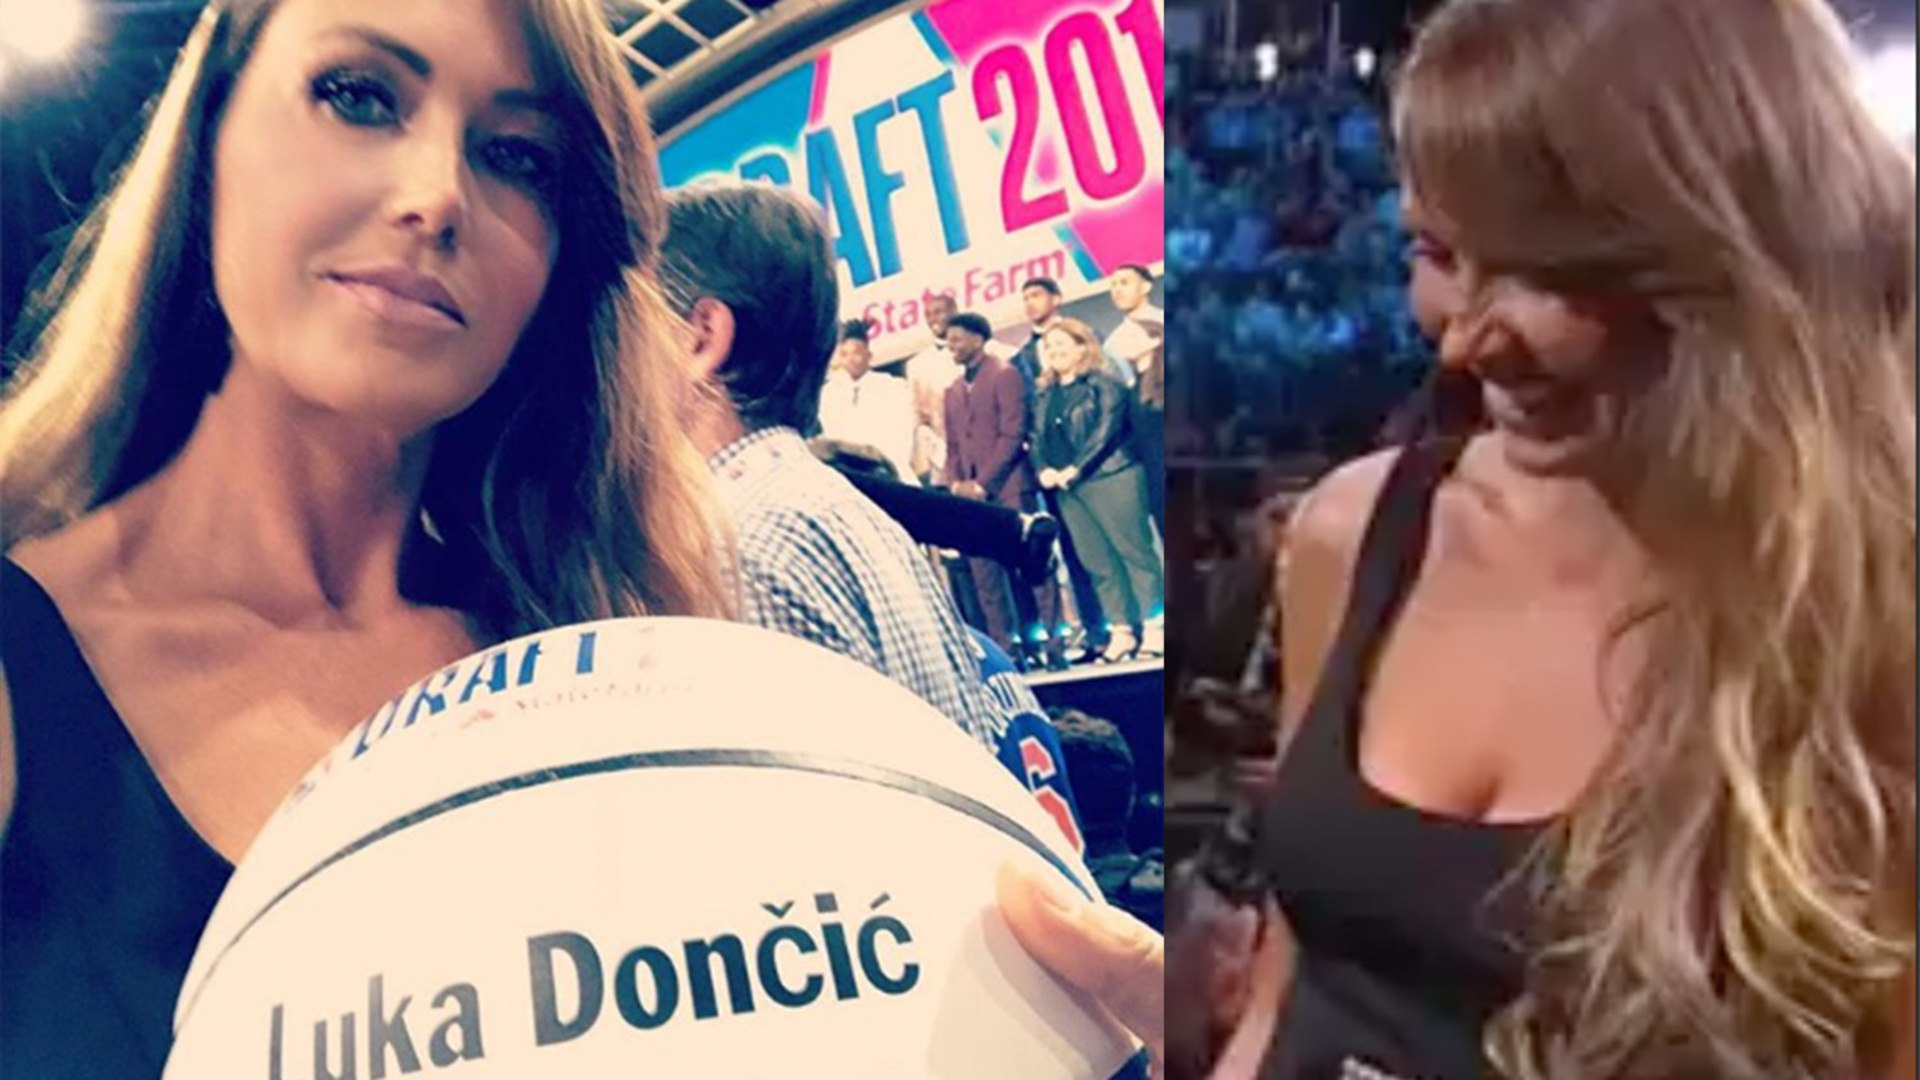 Luka Dončićs Hot Mom Was The Star Of The Nba Draft